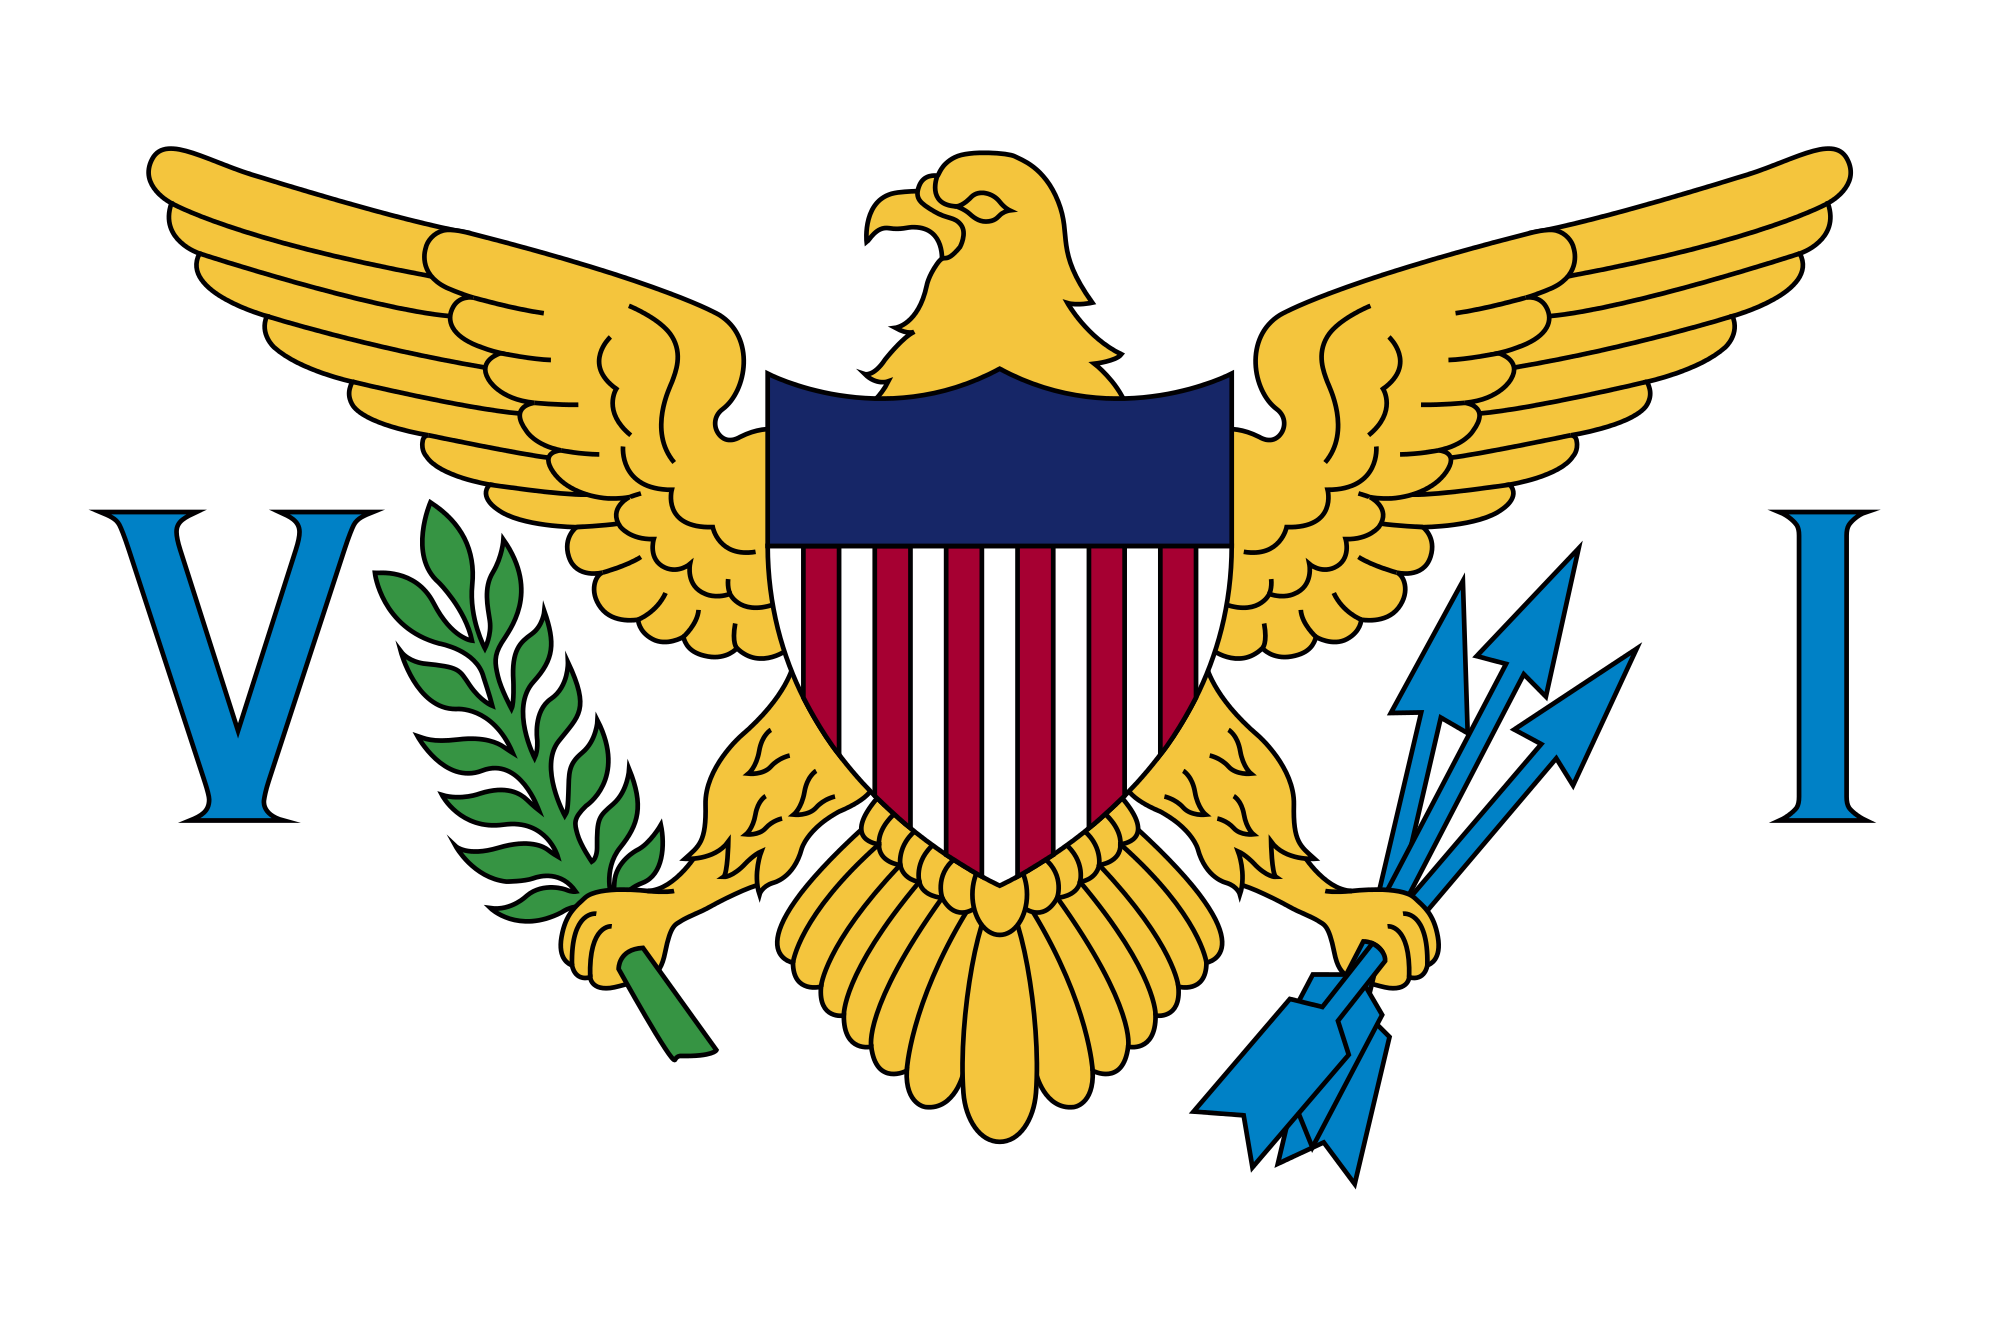 islas virgenes estadounidenses, देश, emblema, लोग�प्रतीकbolo - HD वॉलपेपर - प्रोफेसर-falken.com